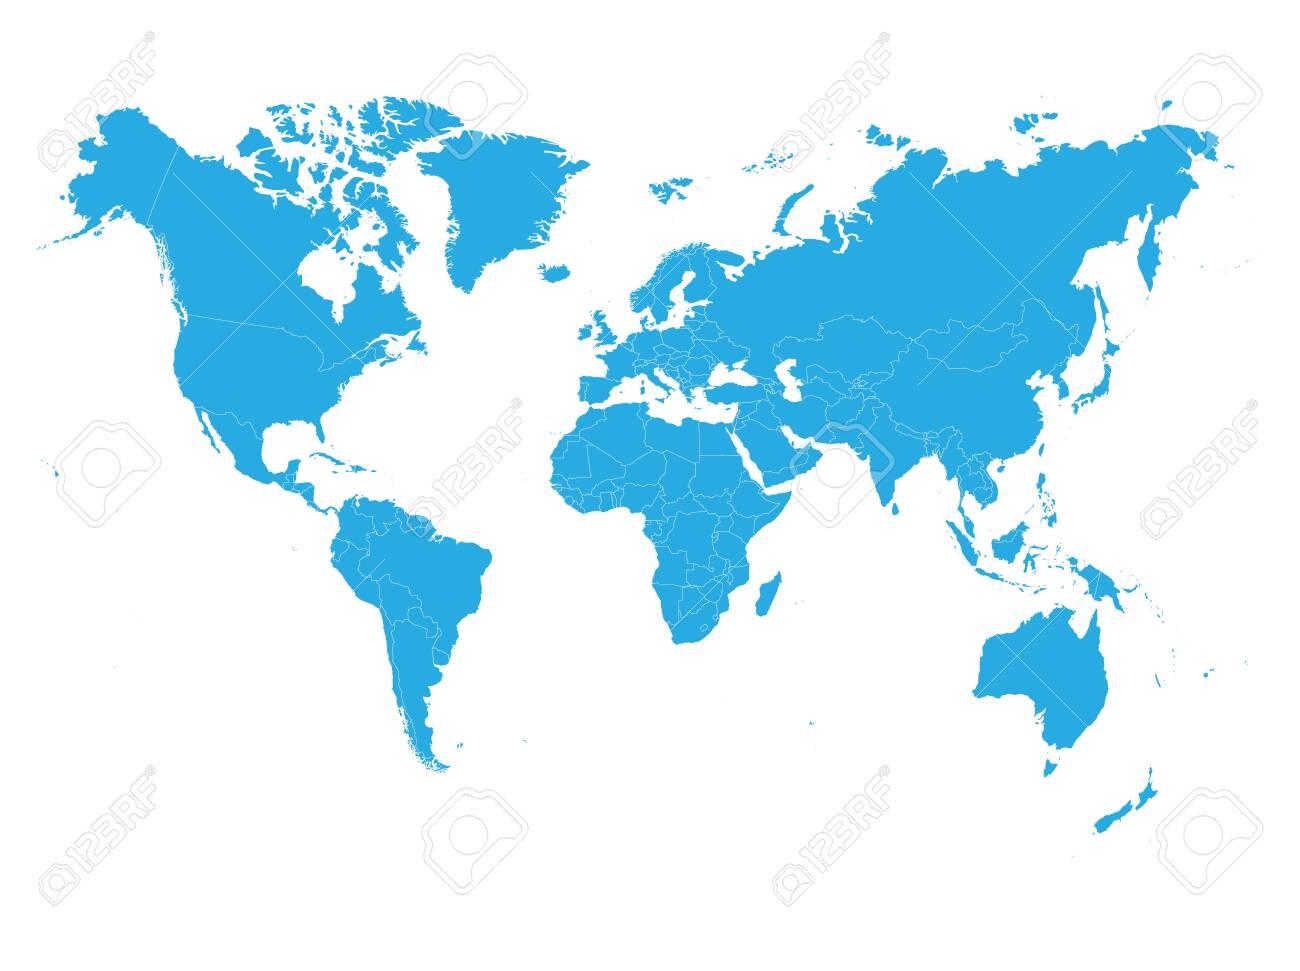 Blue World map on white background. High detail blank political. Vector illustration. - 123689026